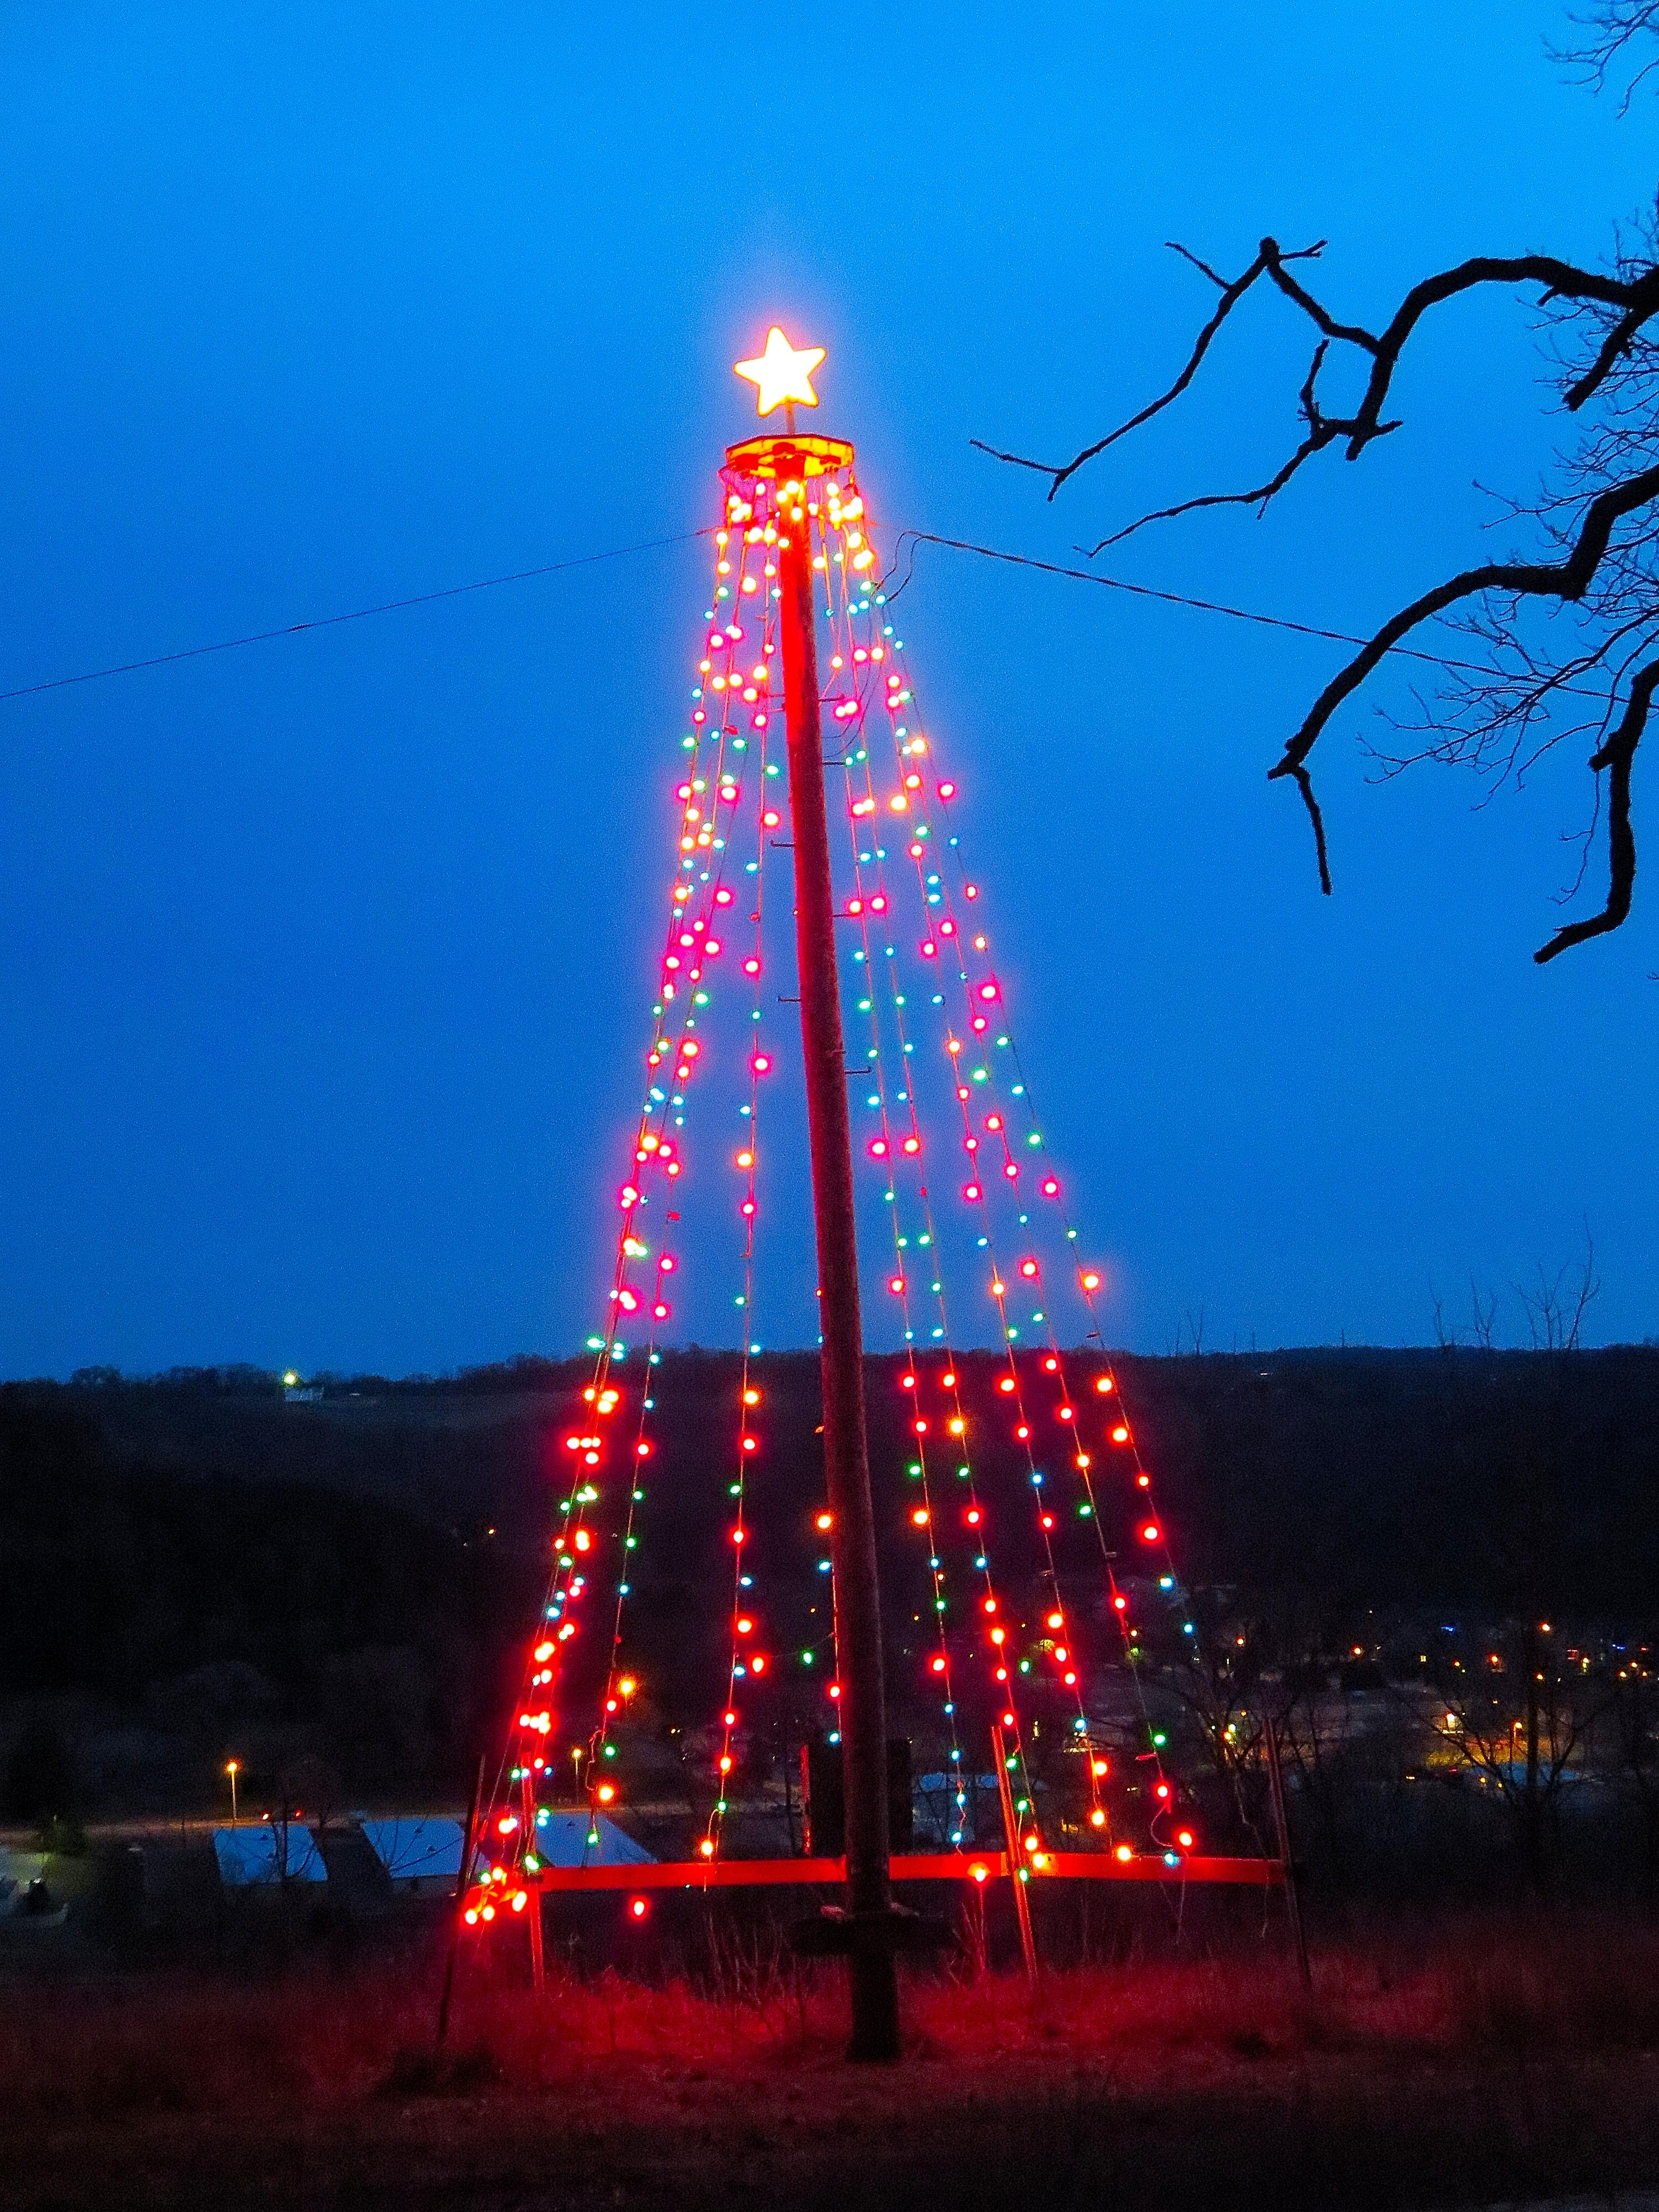 filecross plains hilltop christmas tree panoramio 1jpg - Hilltop Christmas